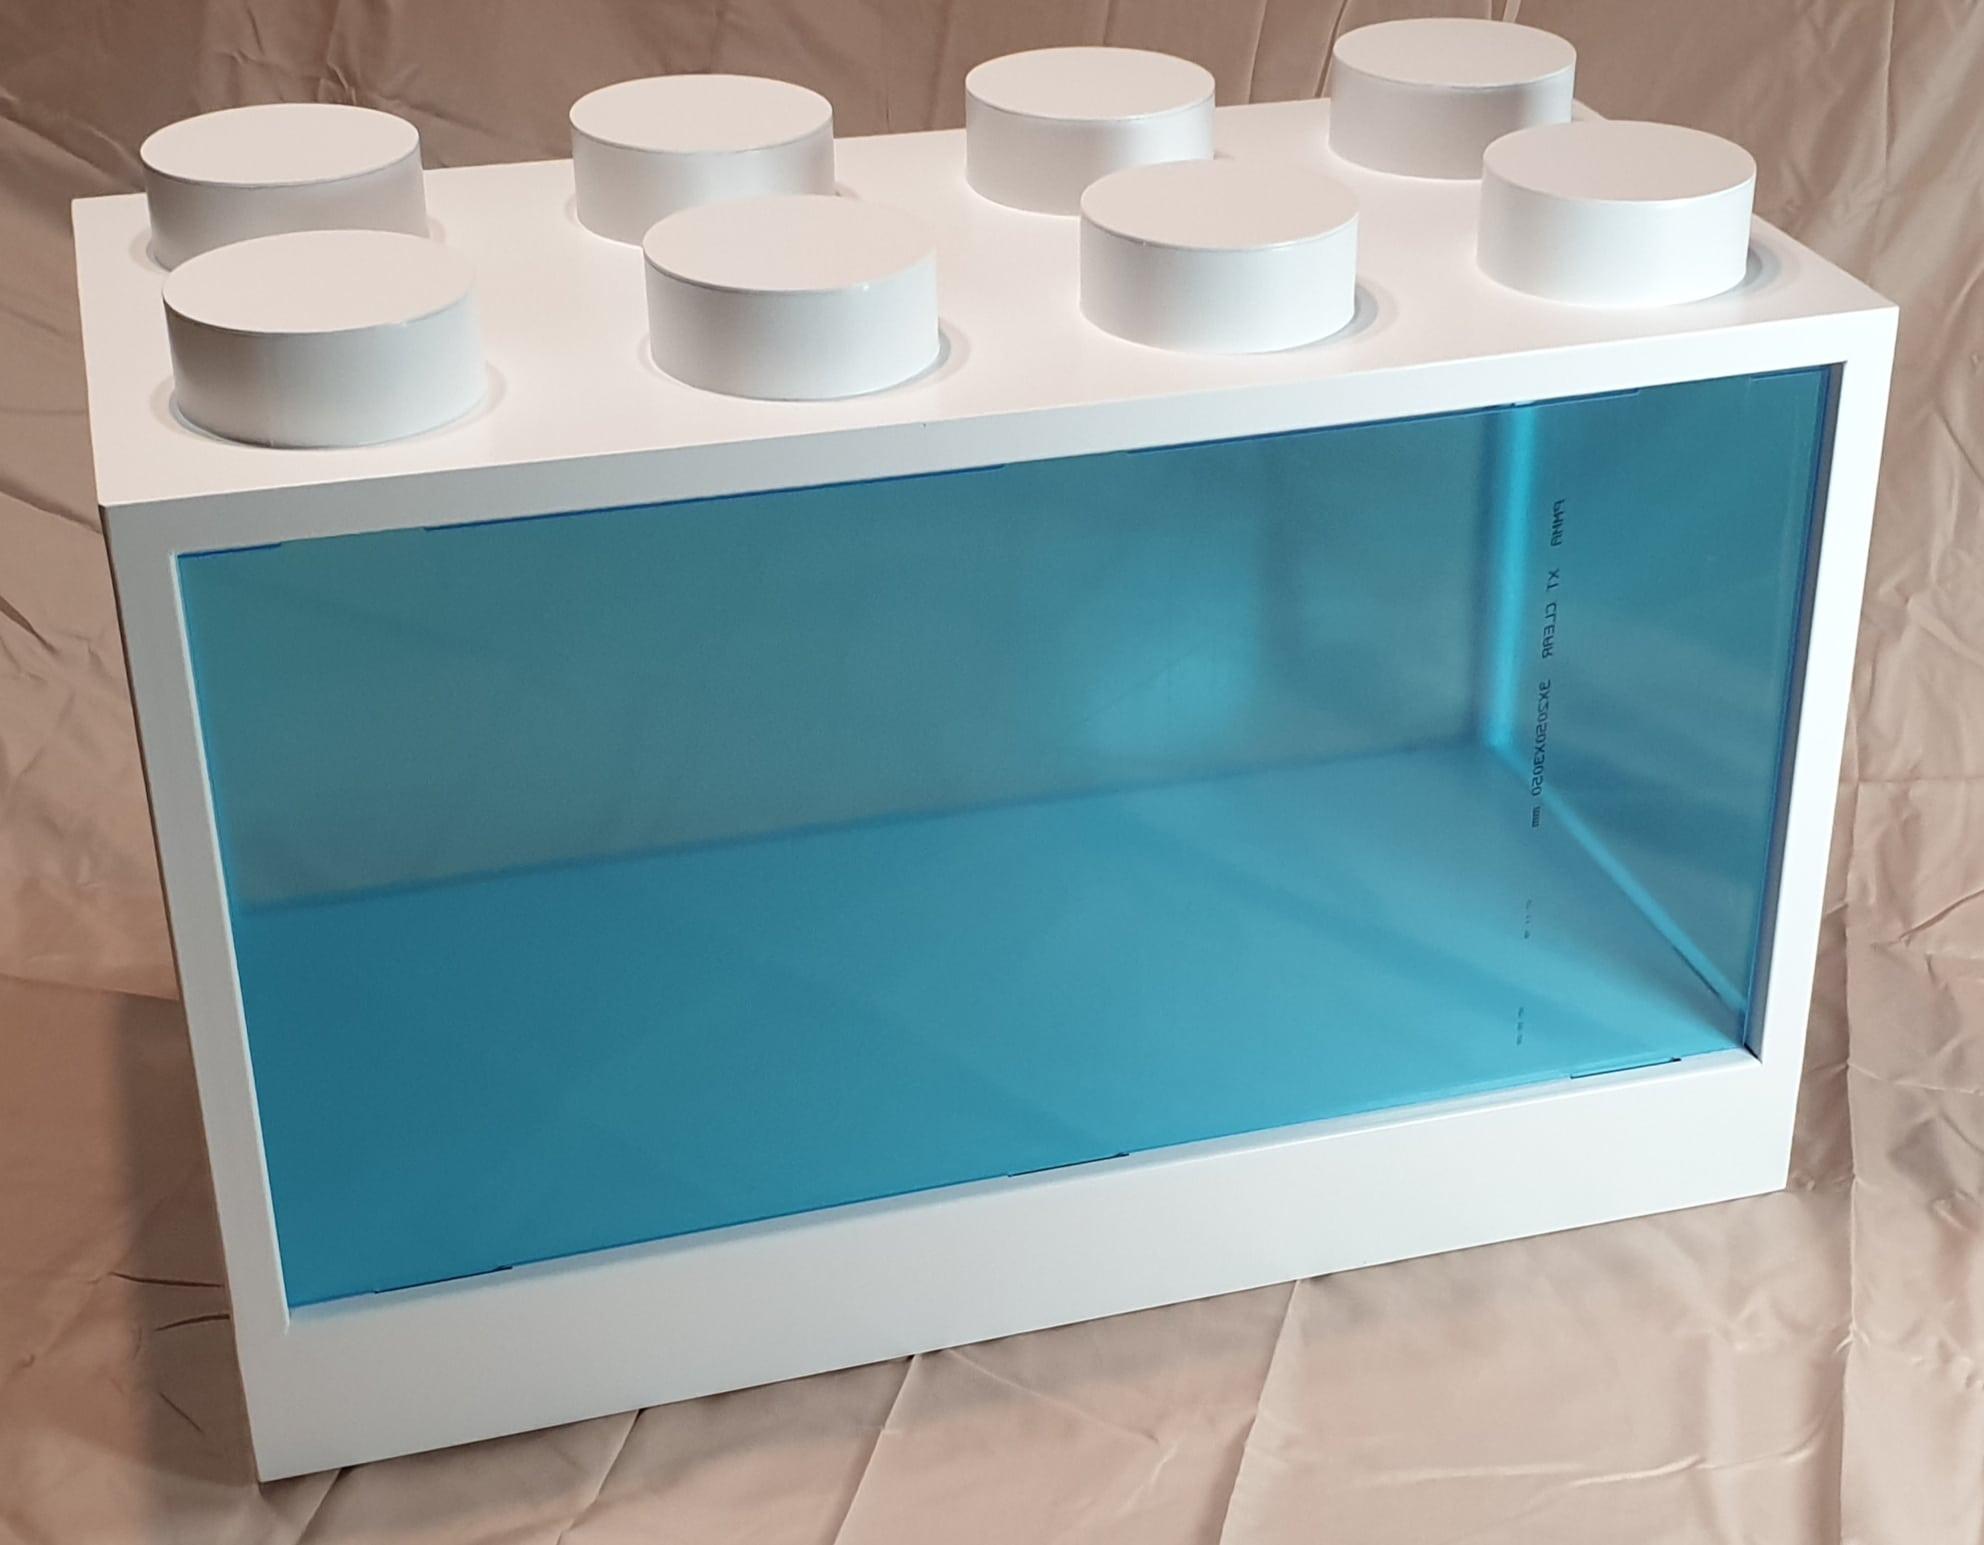 lego display box